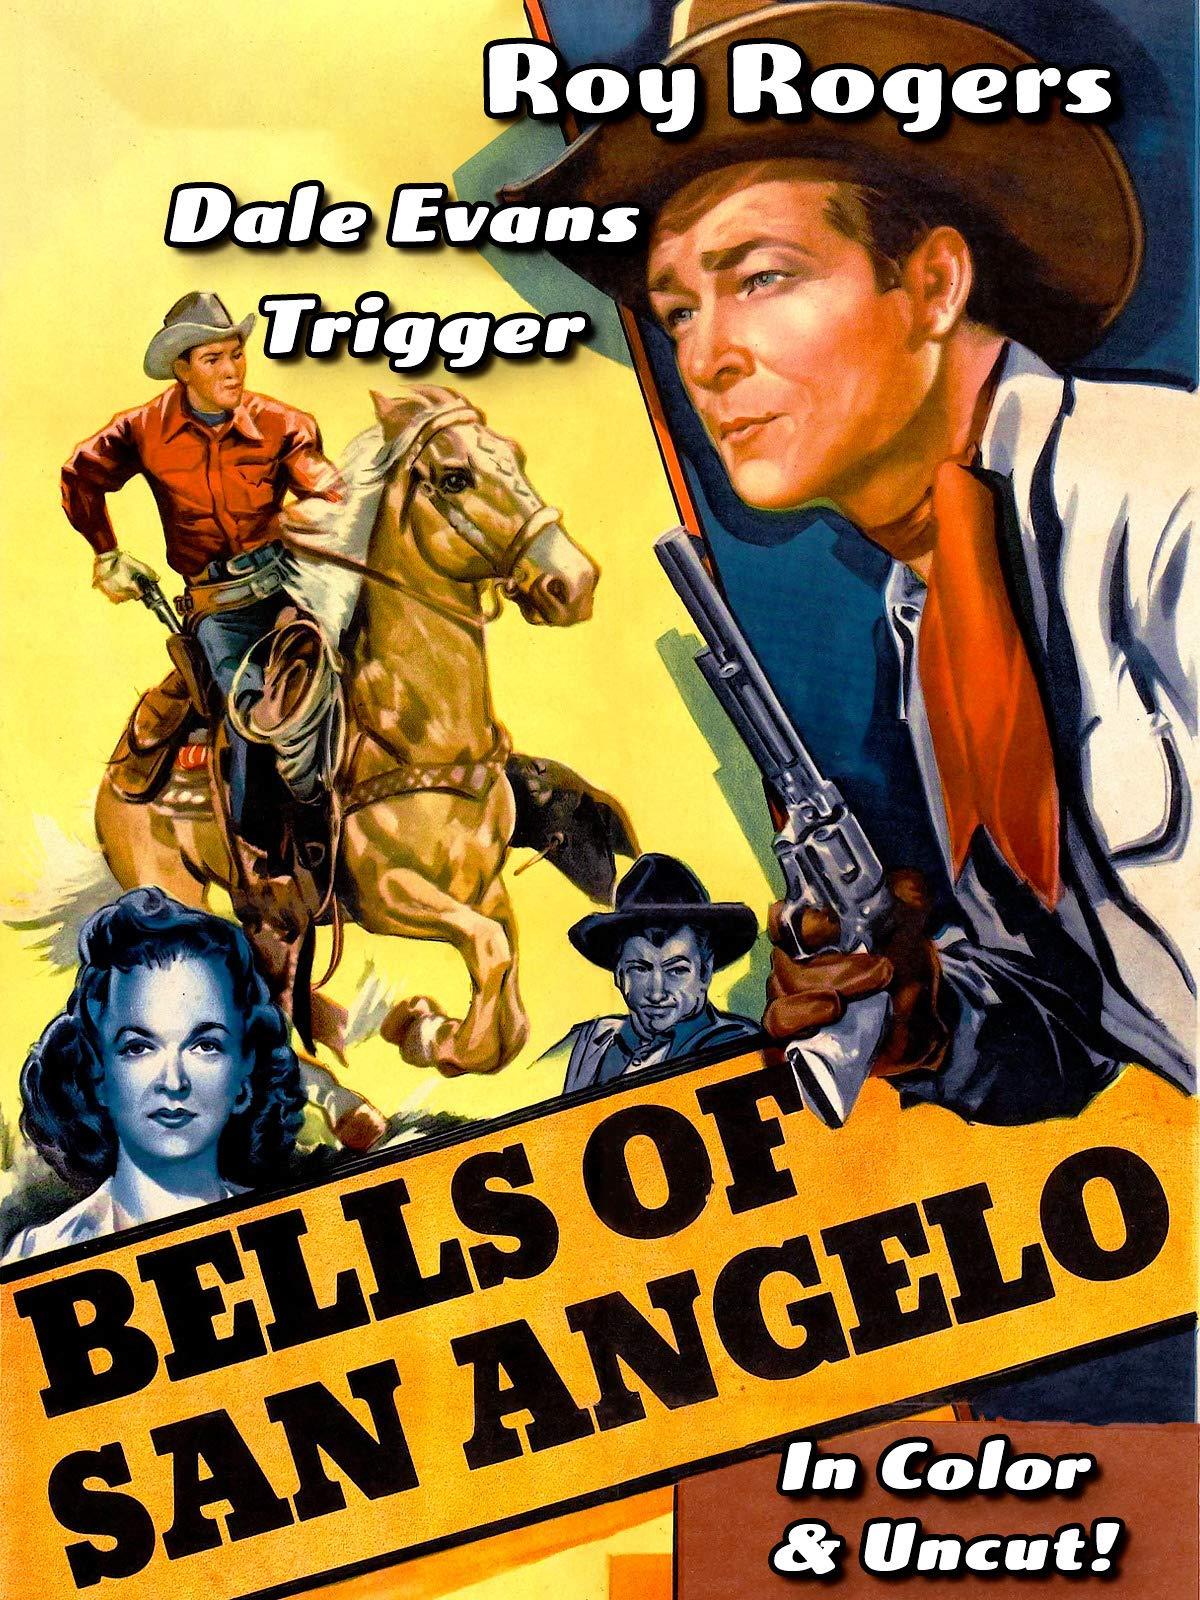 Bells Of San Angelo - Roy Rogers, Dale Evans, Trigger, In Color & Uncut!